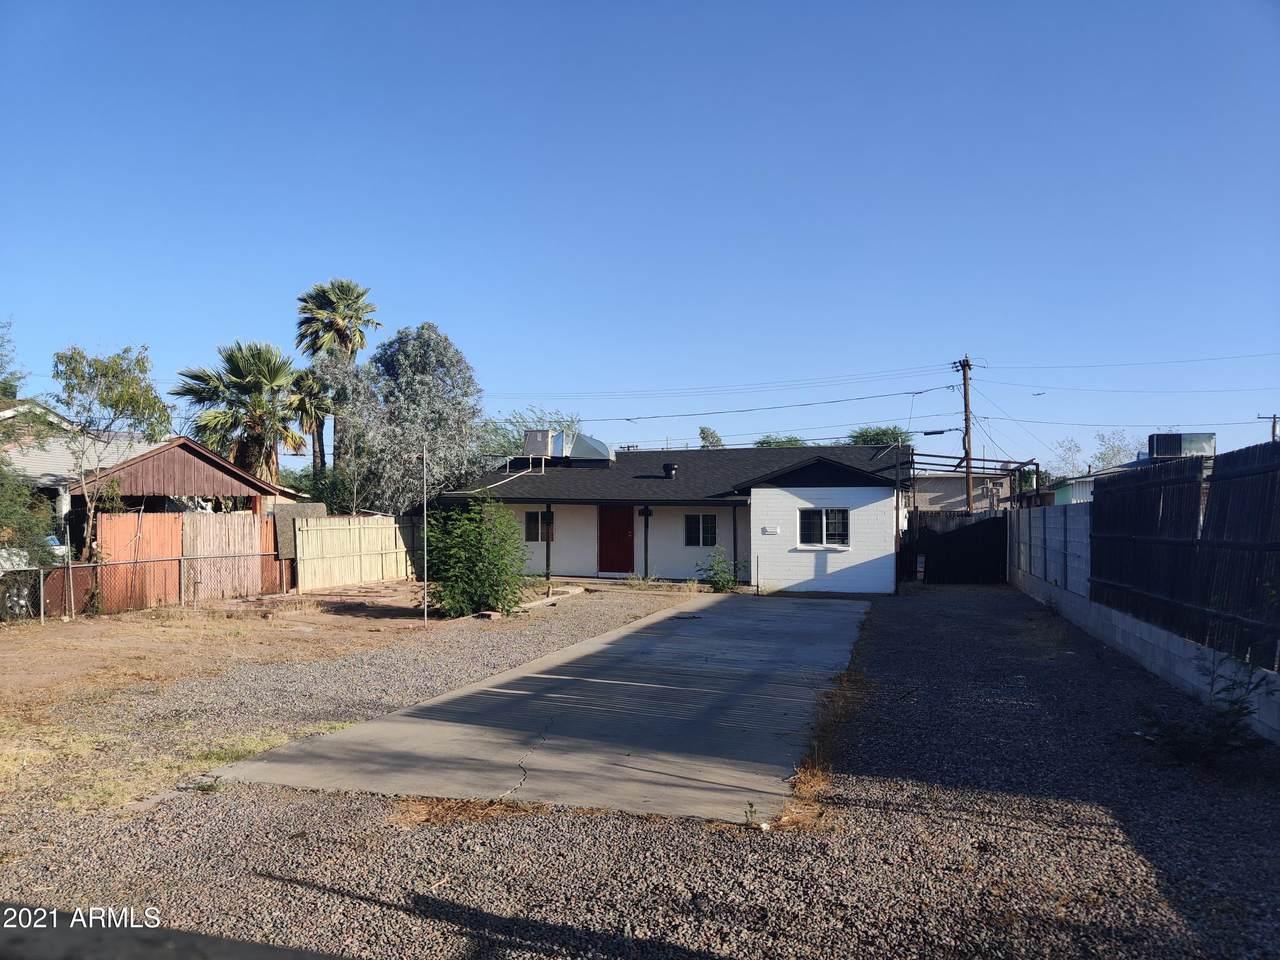 2203 Portland Street - Photo 1